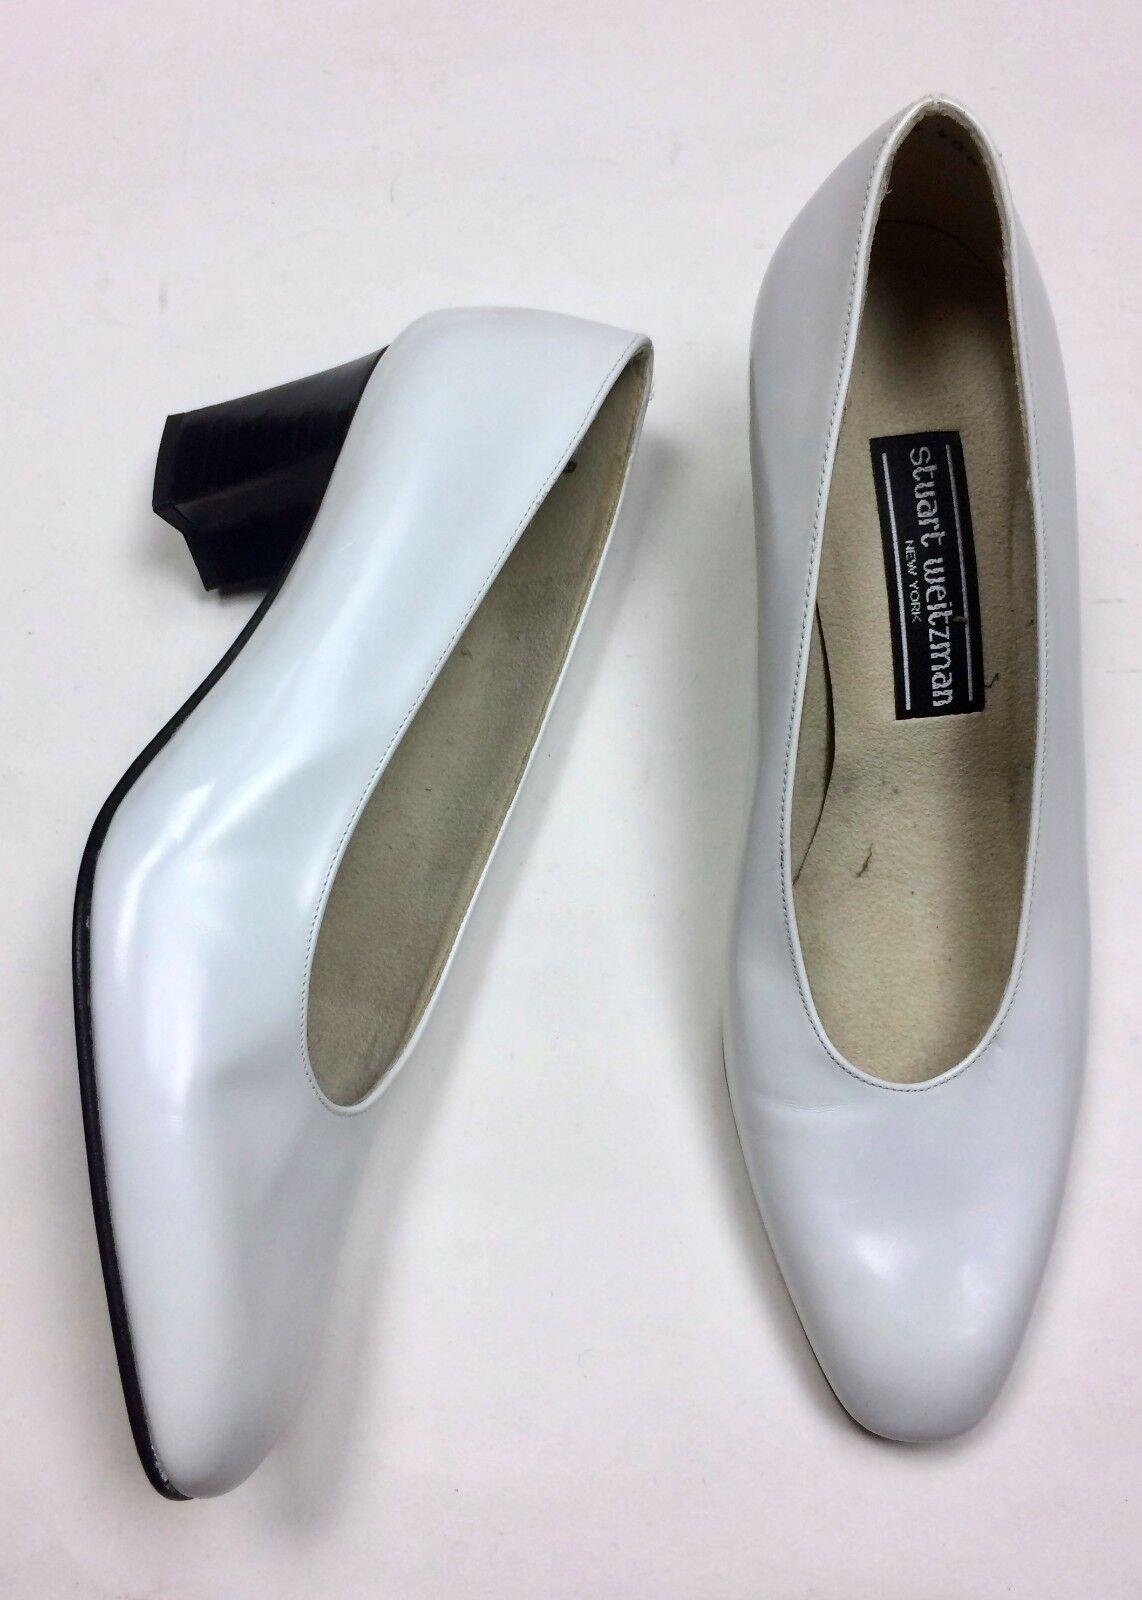 NEU Stuart Weitzman 8 B WEISS Leder Block Heel Closed Toe Pumps Heels Vintage